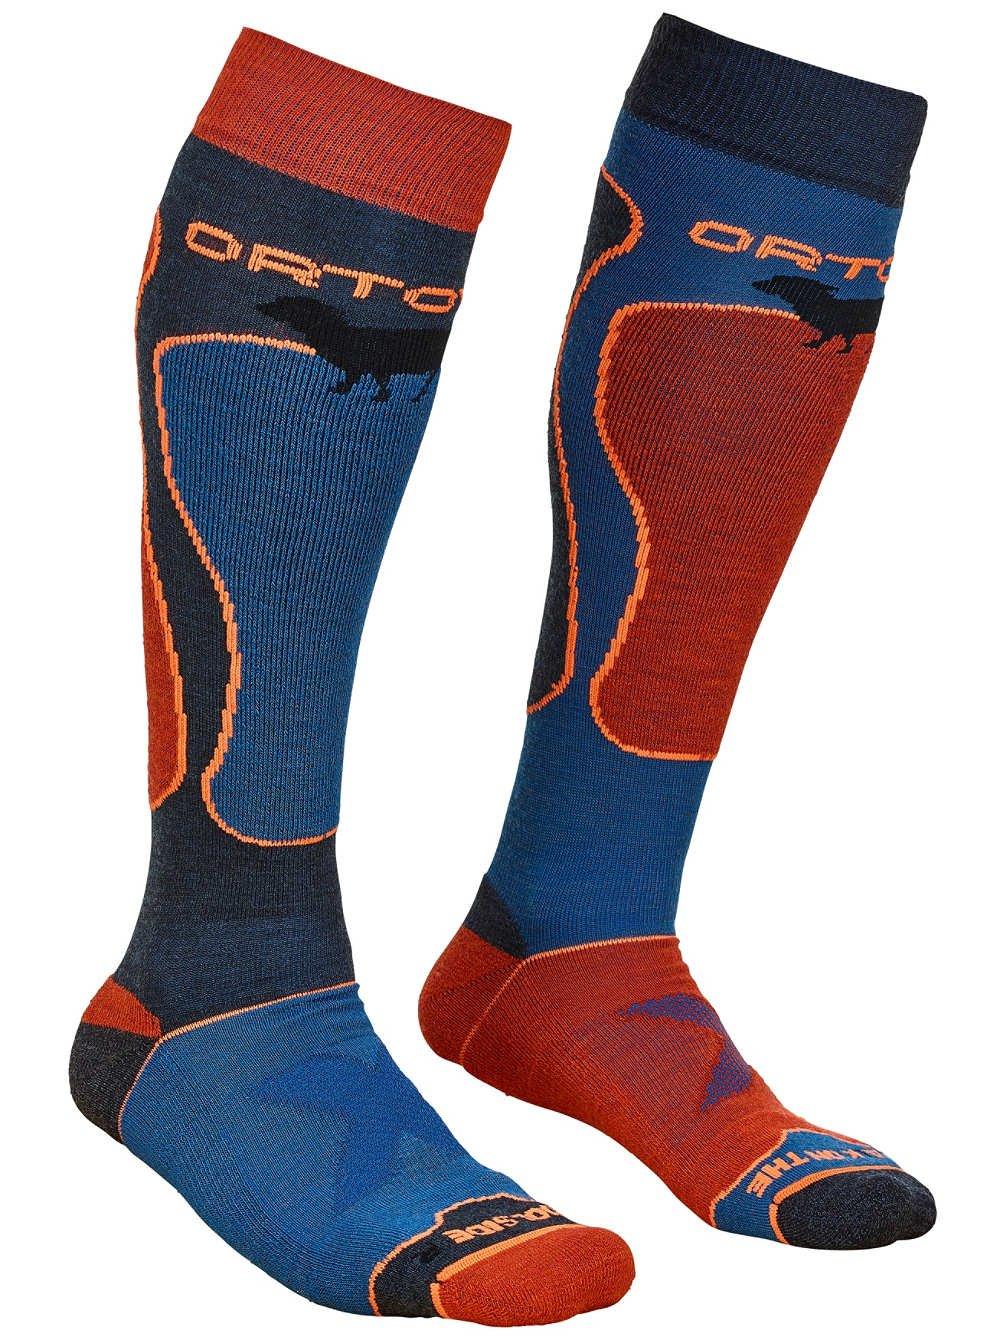 Ortovox Herren Ski Rock 'N' Wool Socken